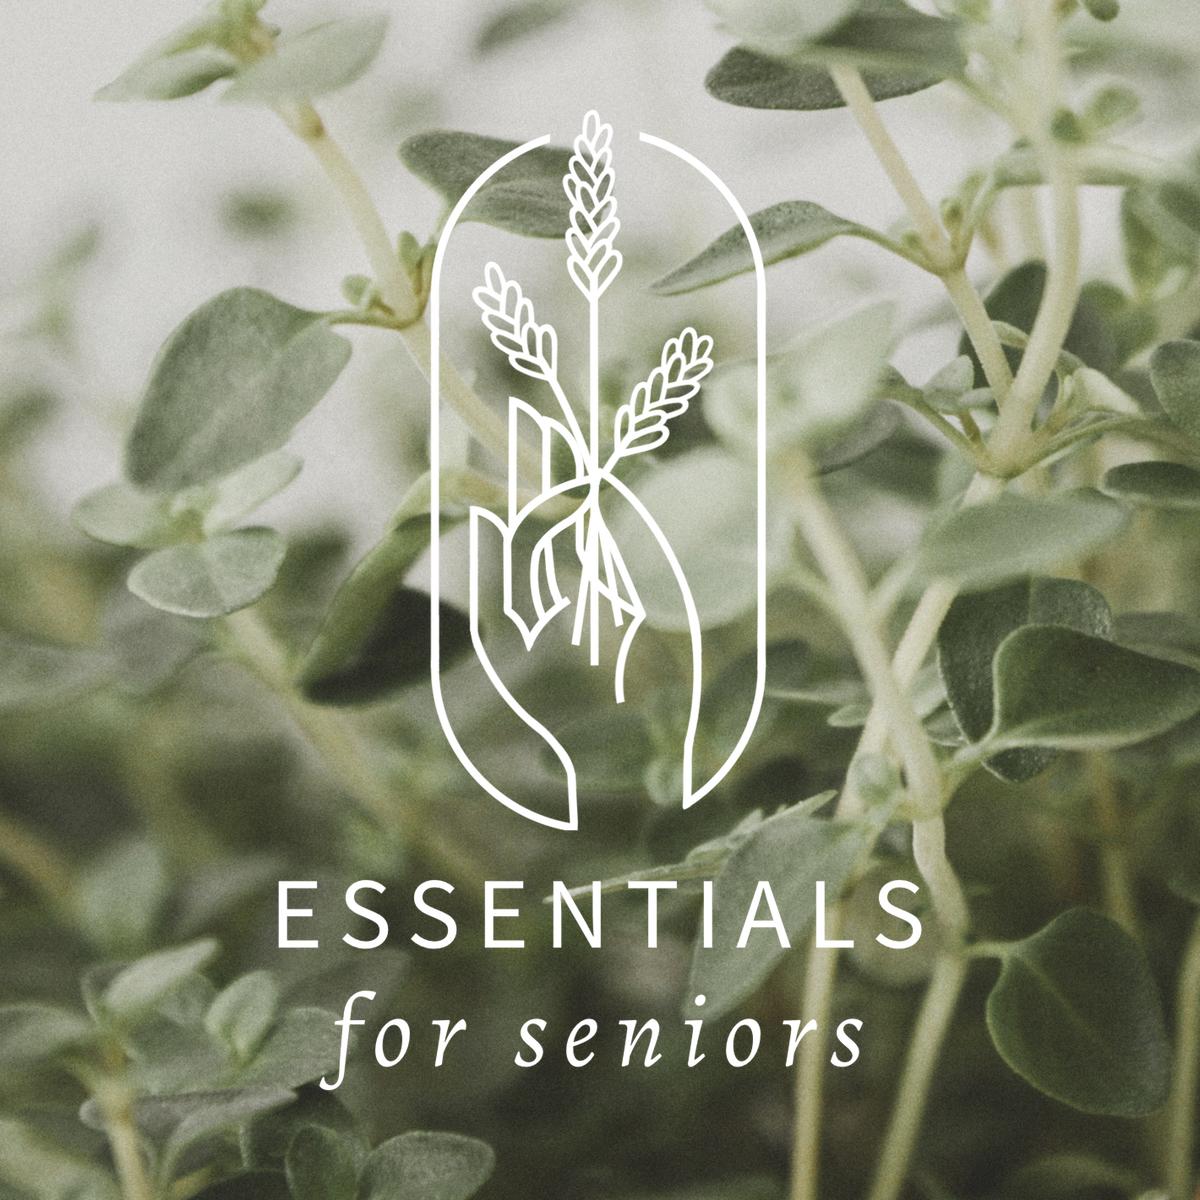 essentialsforseniors.jpg